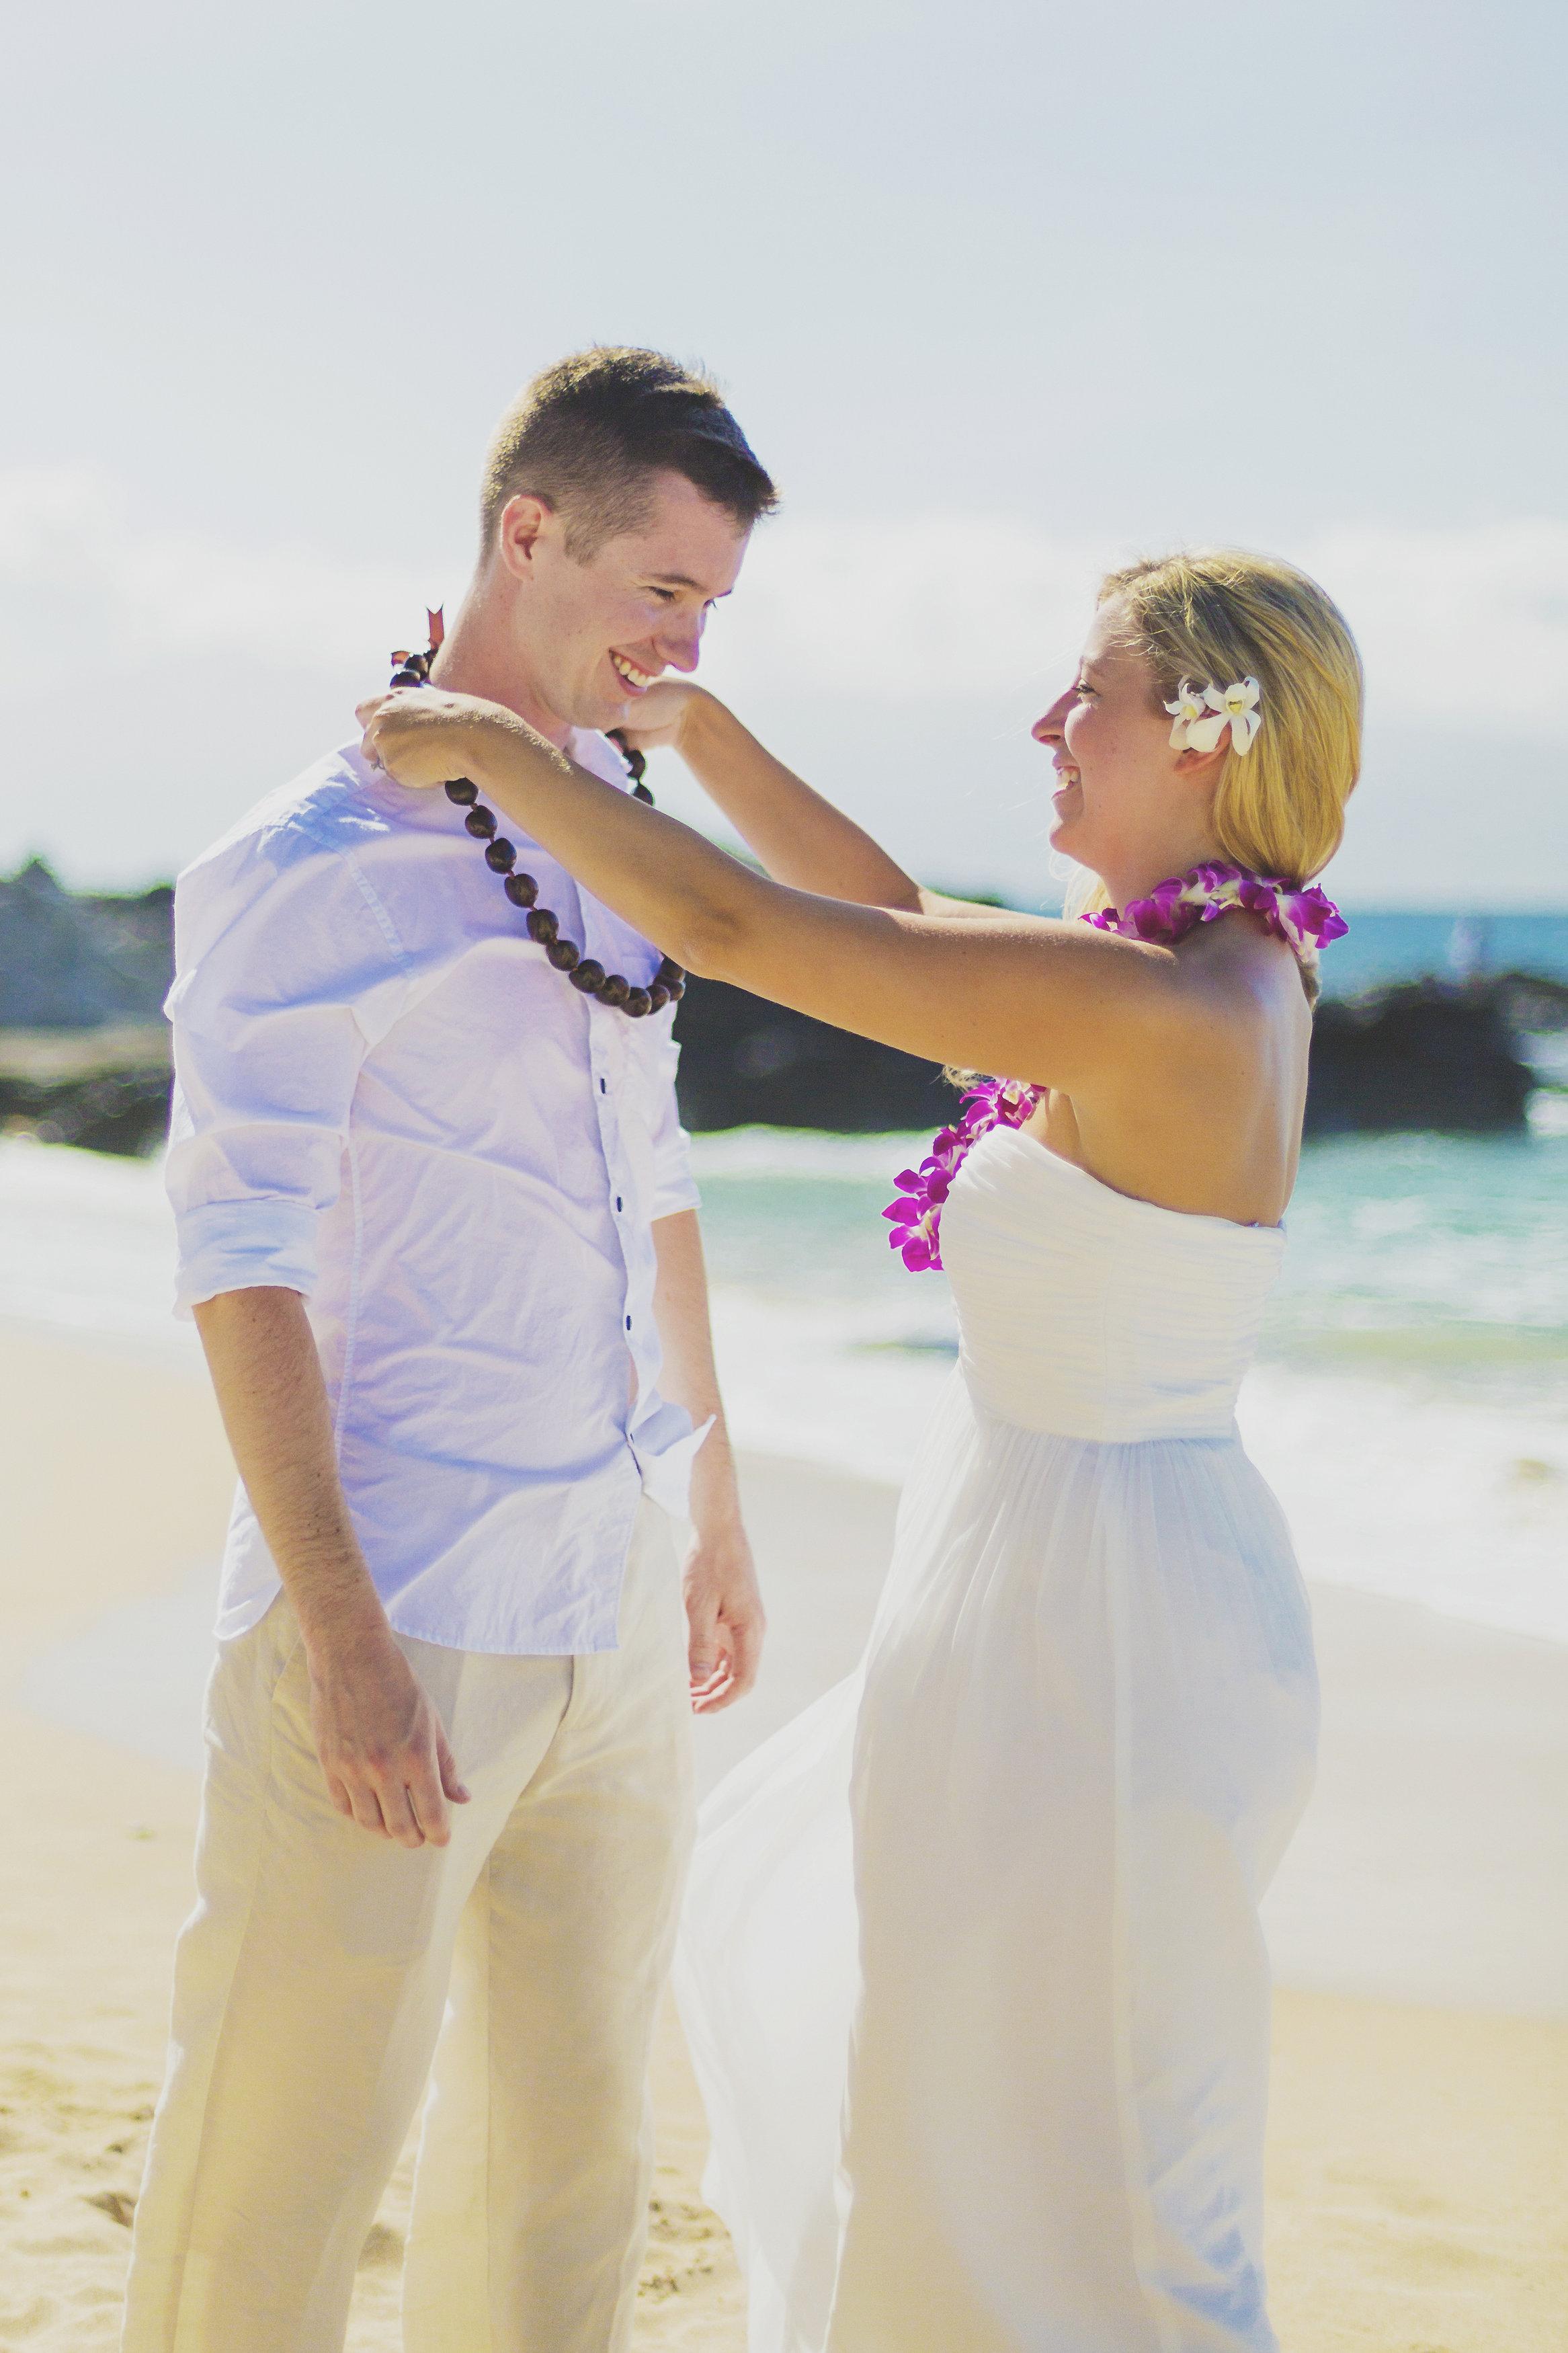 angie-diaz-photography-maui-honeymoon-hawaii-elopement-3.jpg